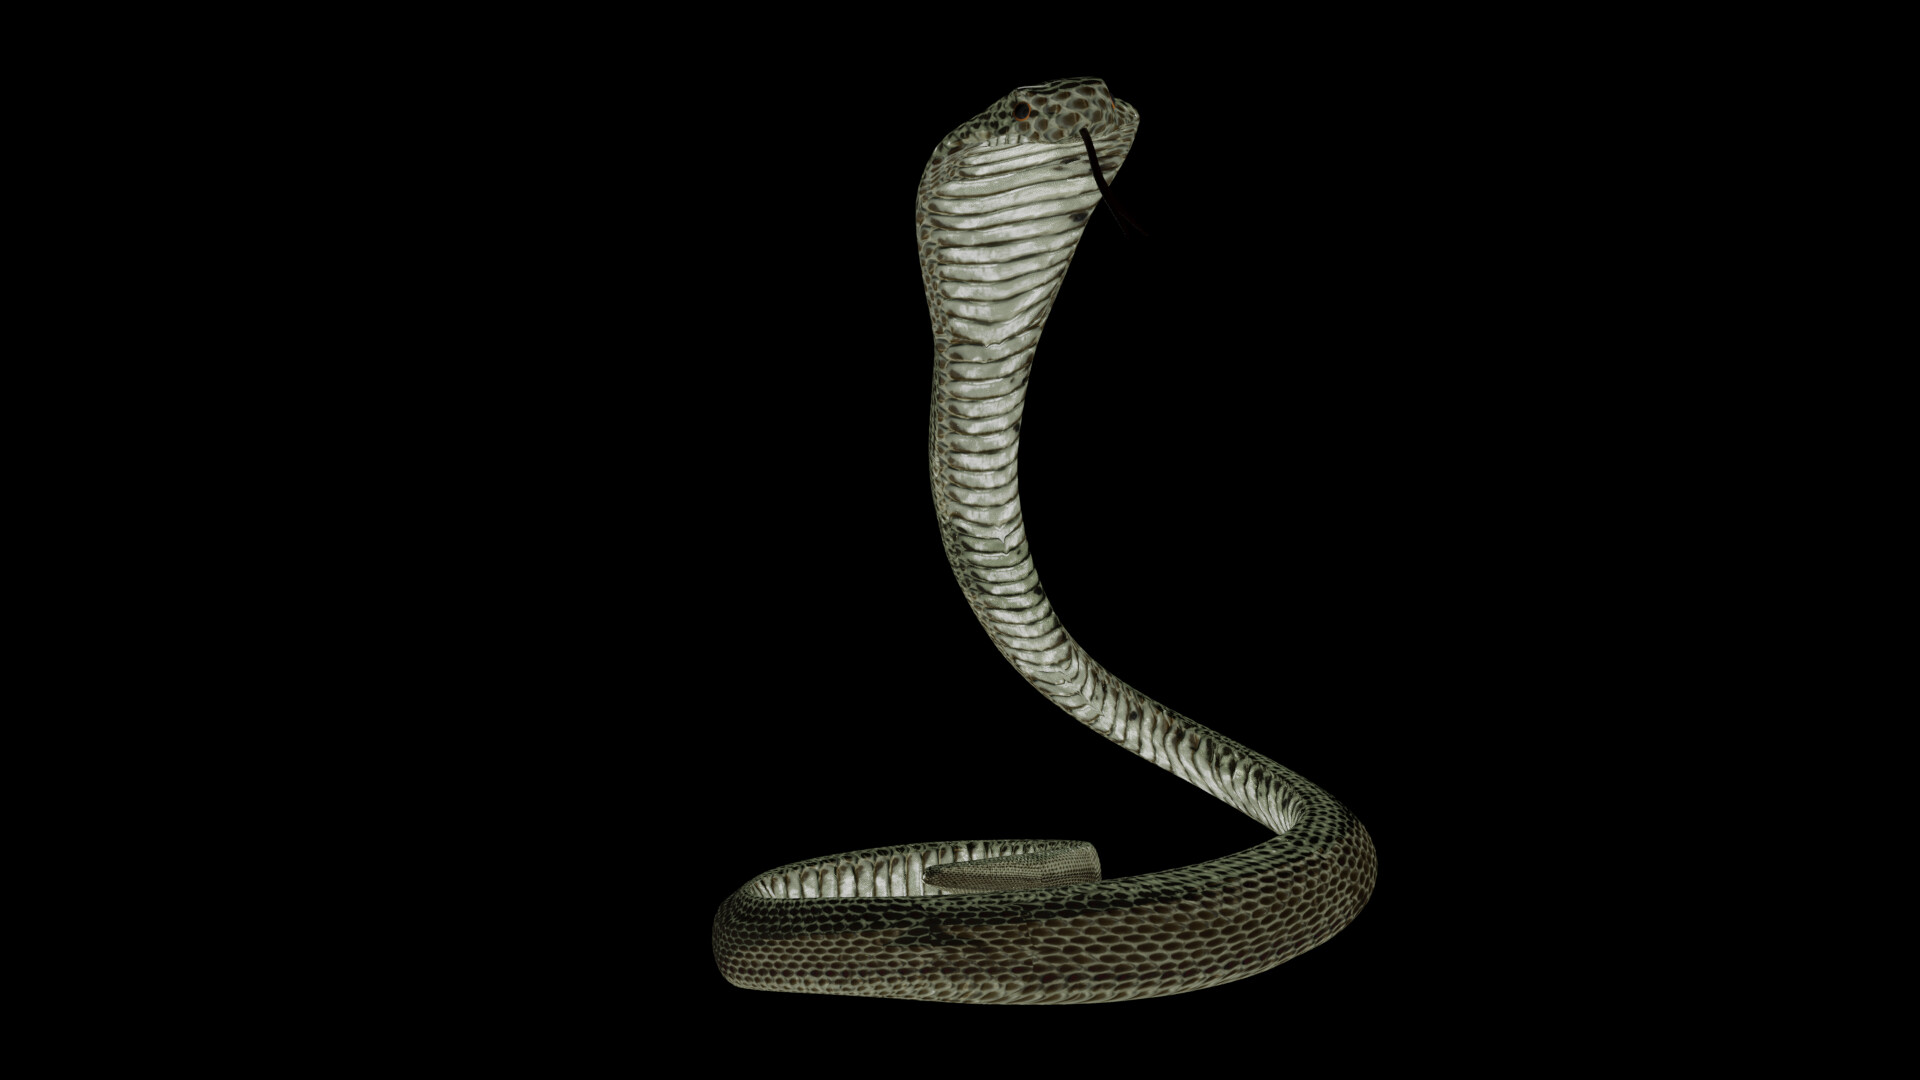 Cobra up front